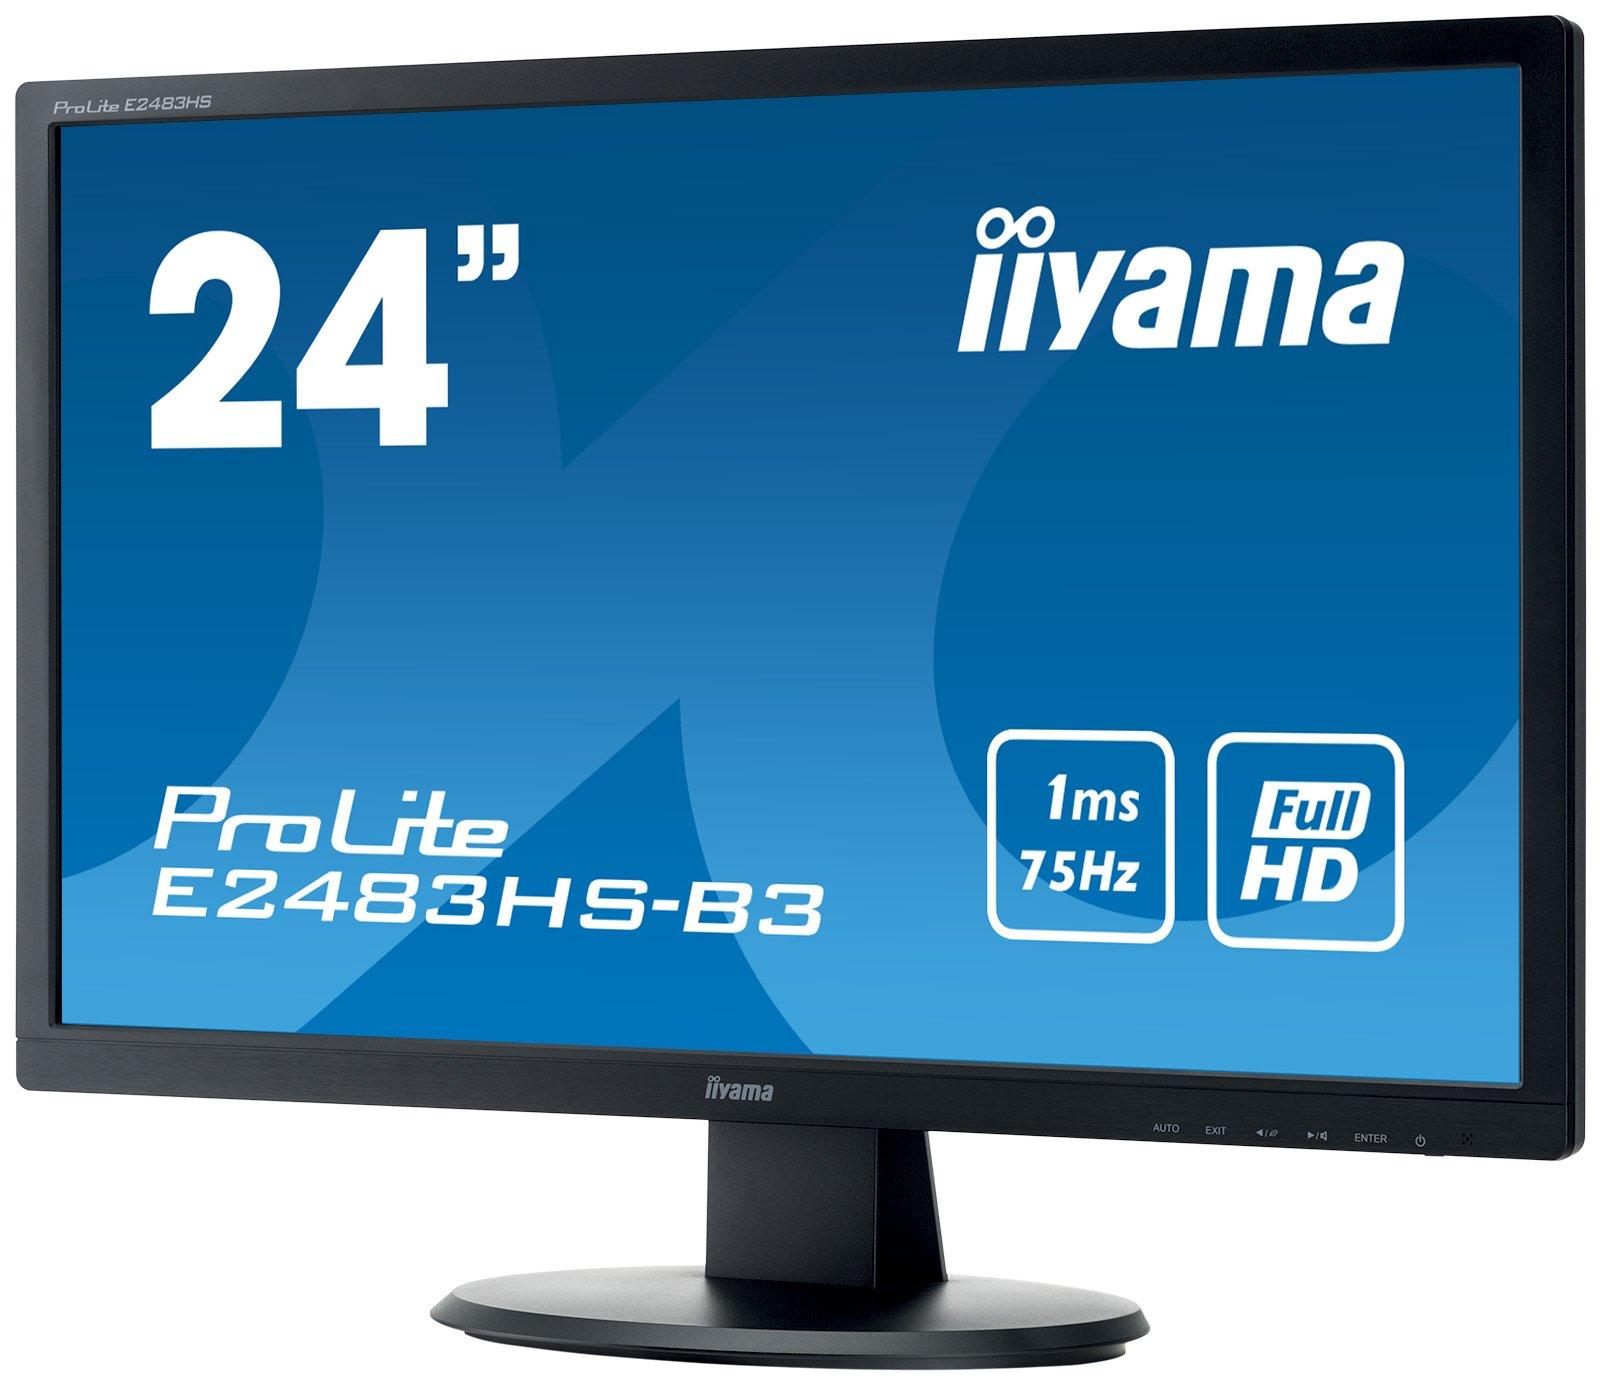 "IIYama e2483hs de B360,96cm (24"") Moniteur Noir product image"